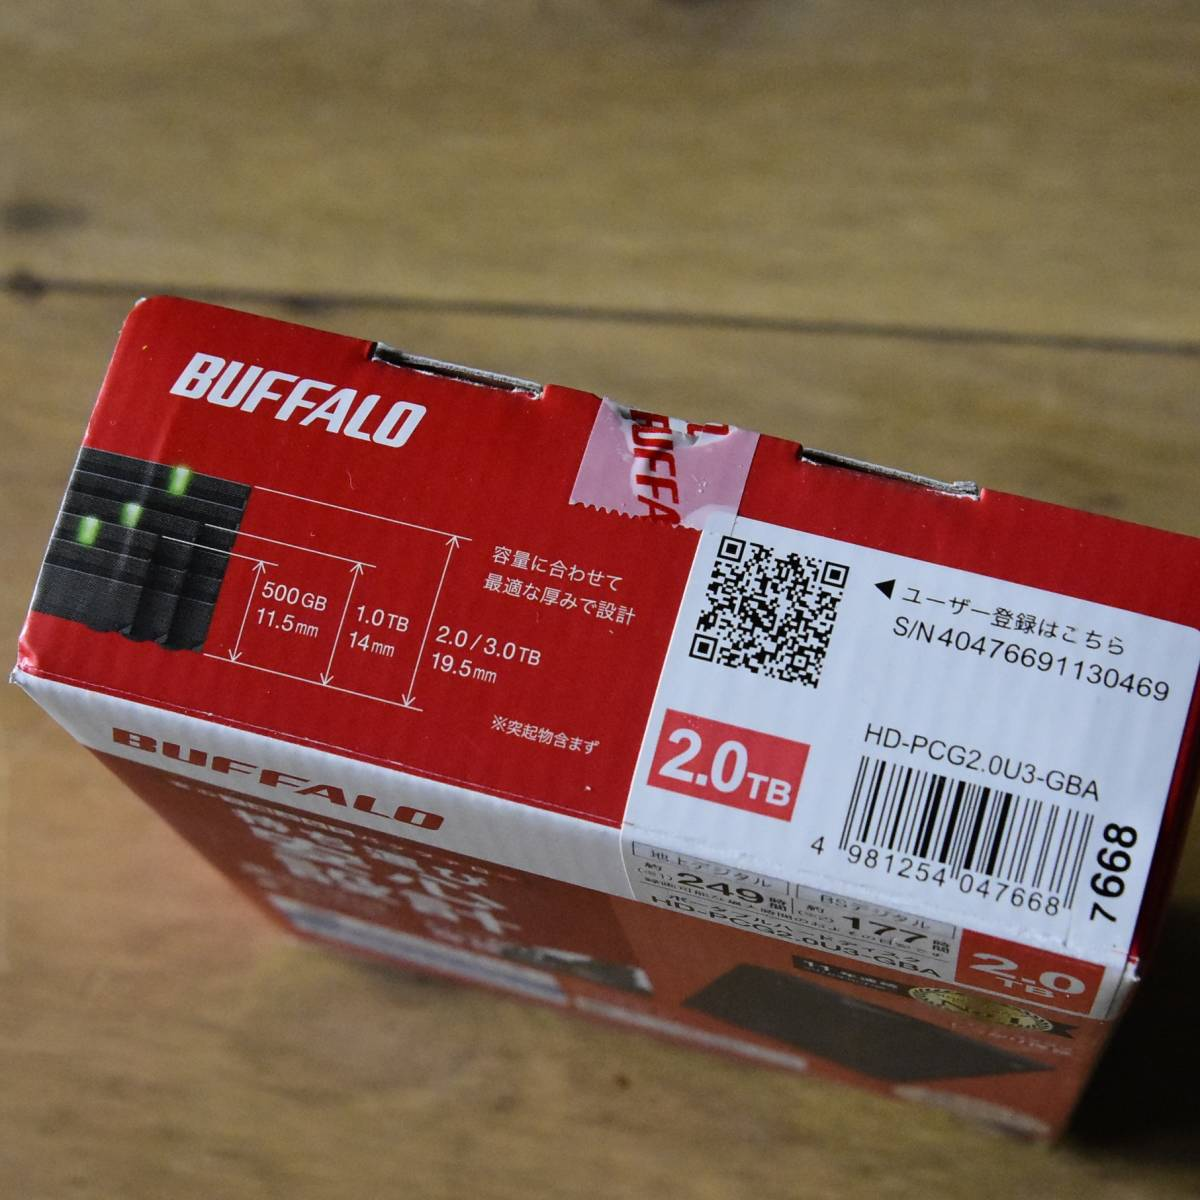 BUFFALO ポータブルハードディスク HD-PCG2.0U3-GBA 2TB